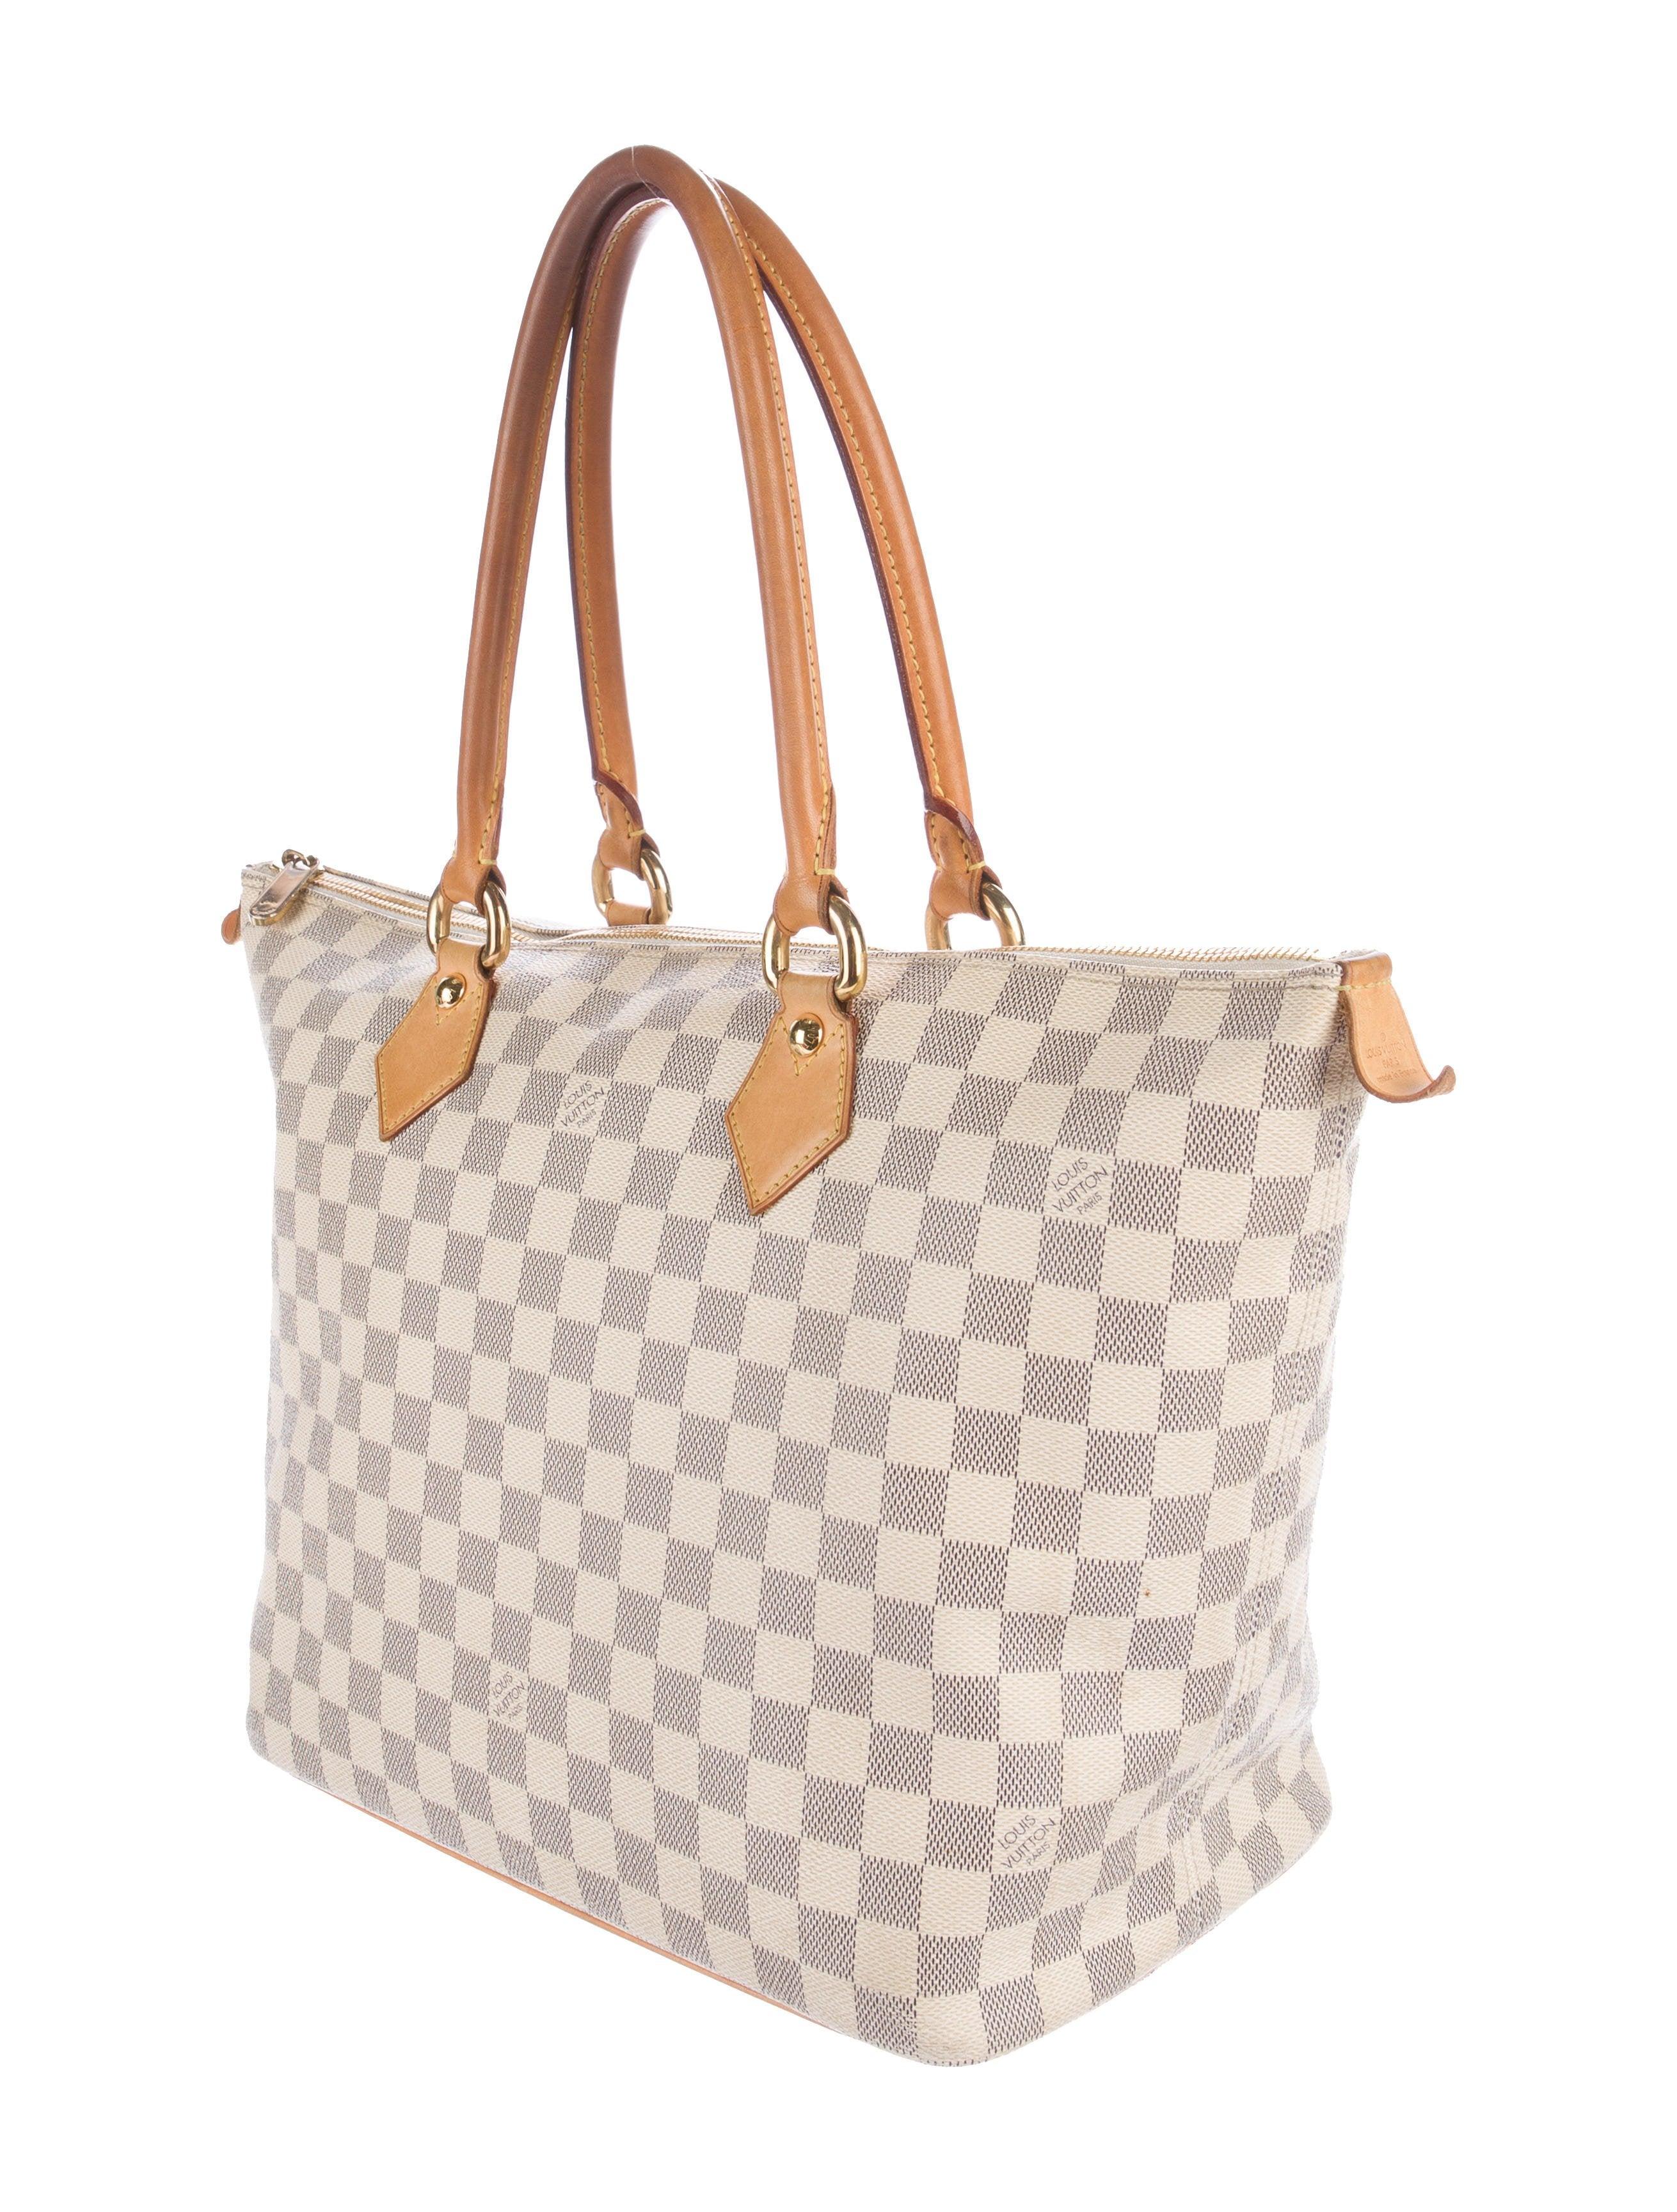 18e56664d48 Louis Vuitton Damier Azur Saleya MM - Handbags - LOU124496